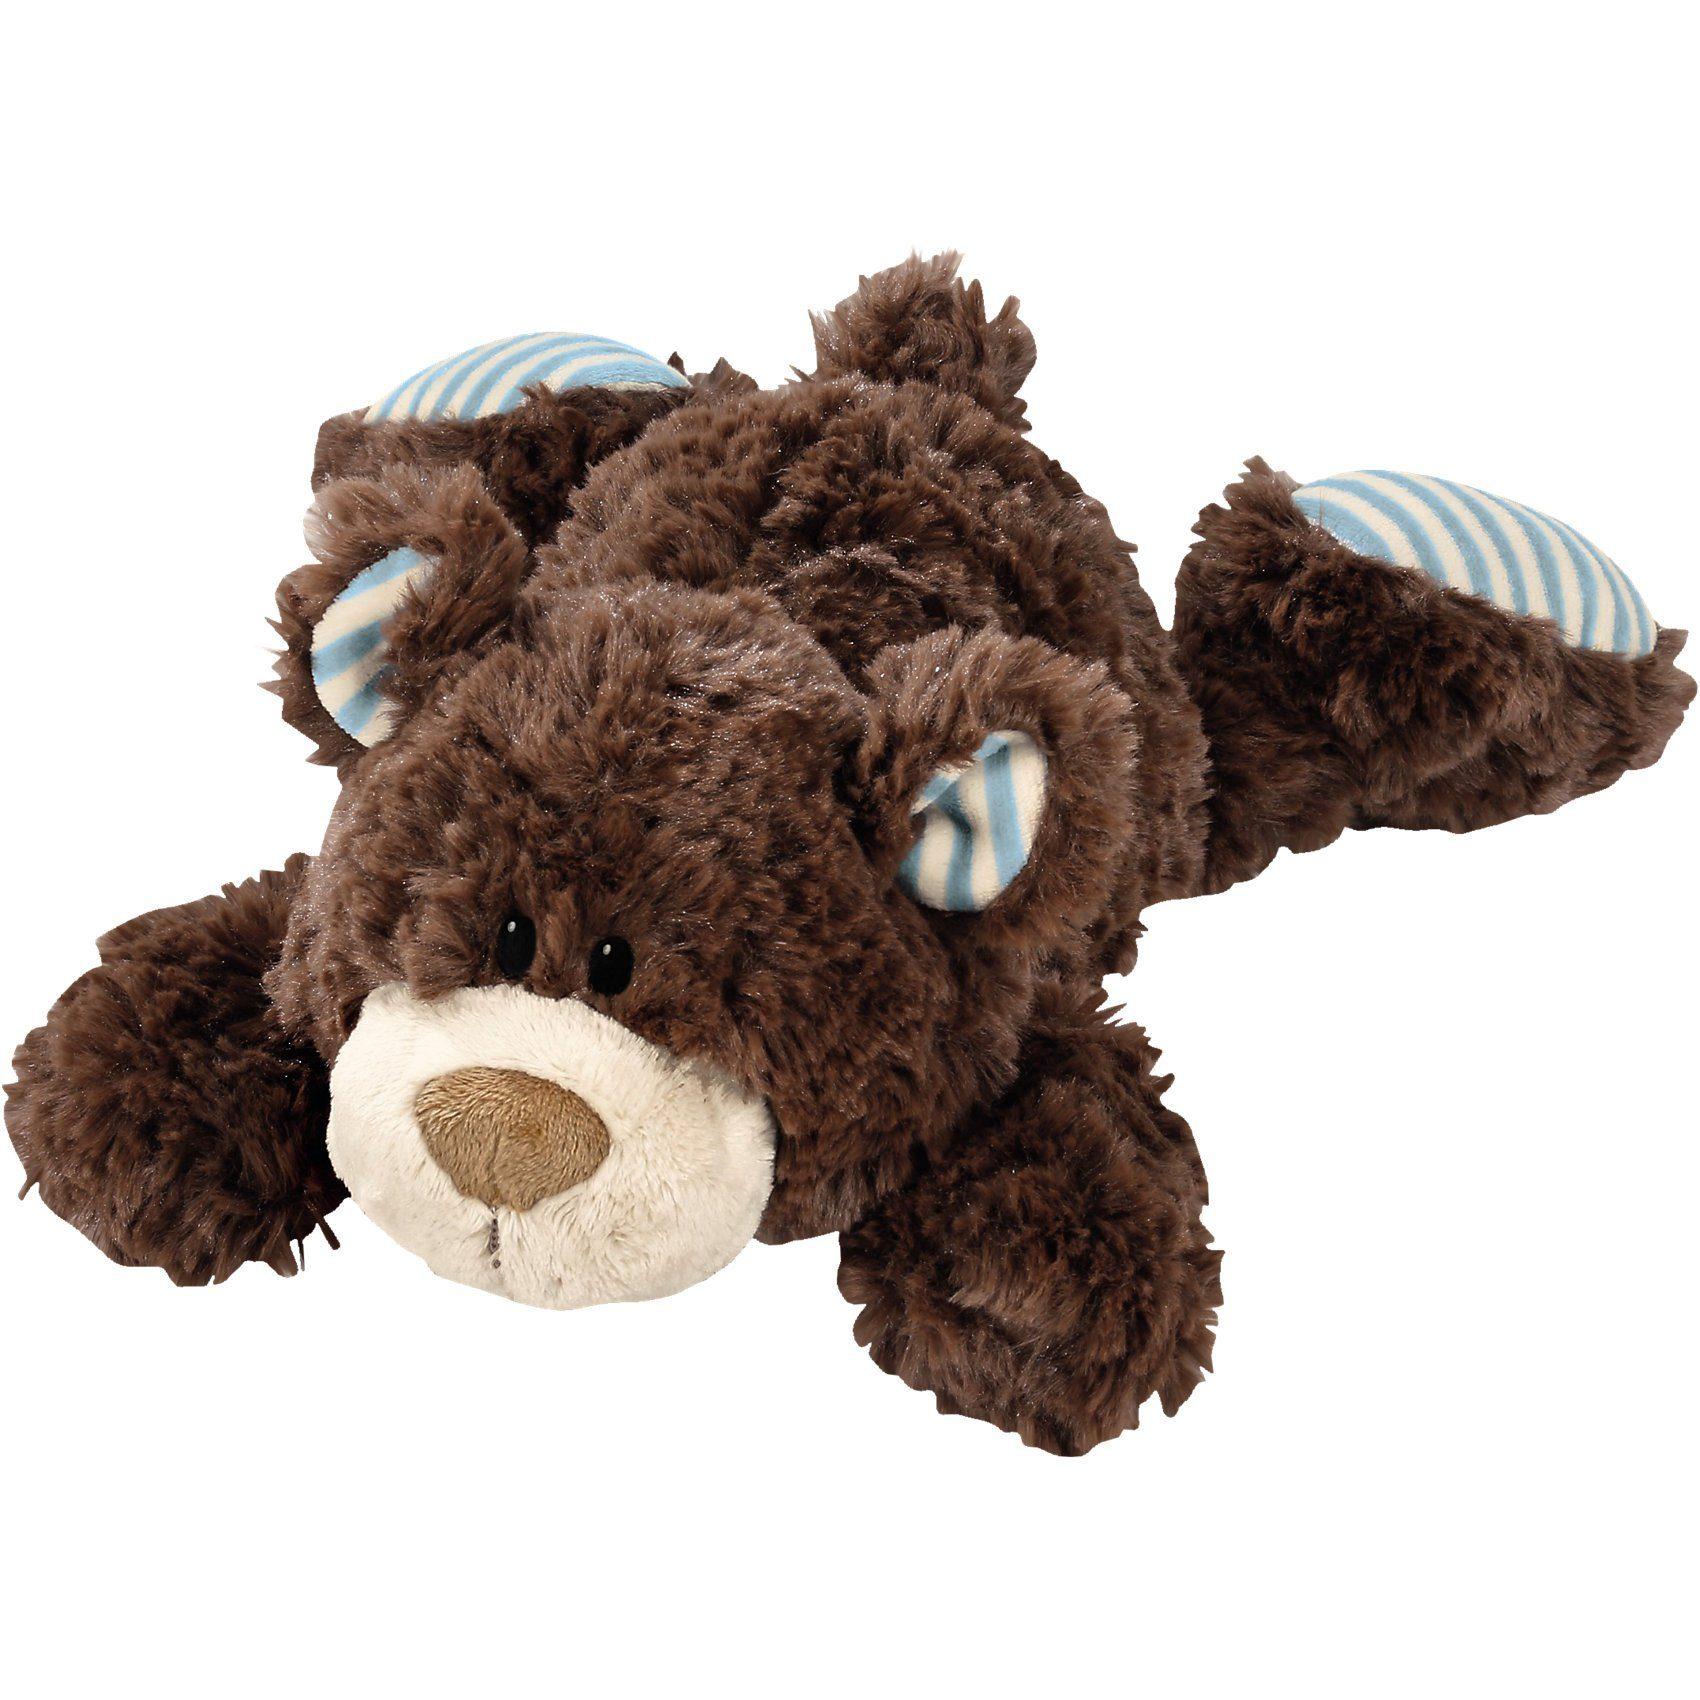 NICI Bär liegend 20cm (SoPo16) (38154)